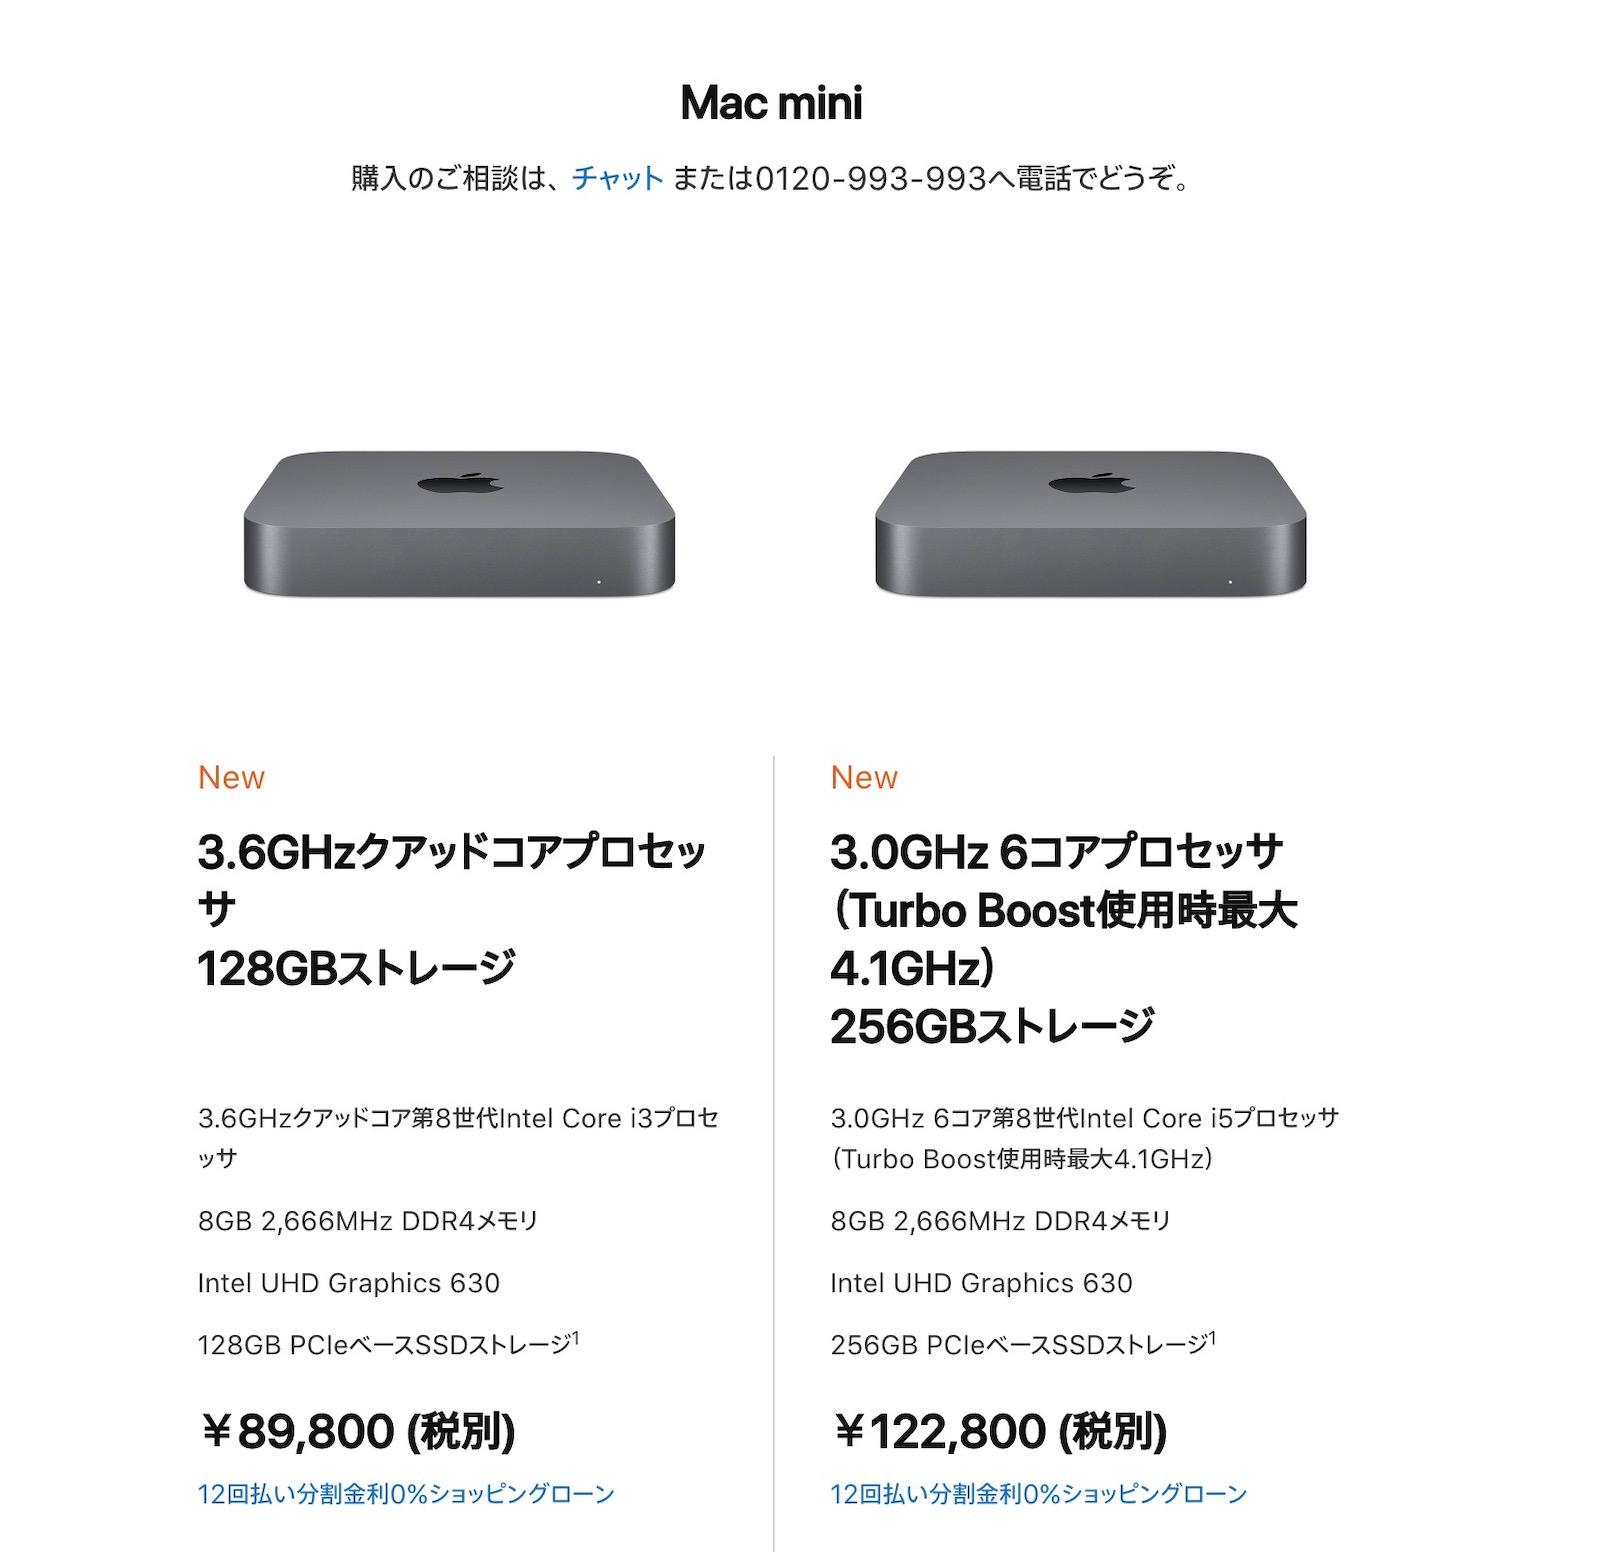 Mac-mini-pricing.jpg